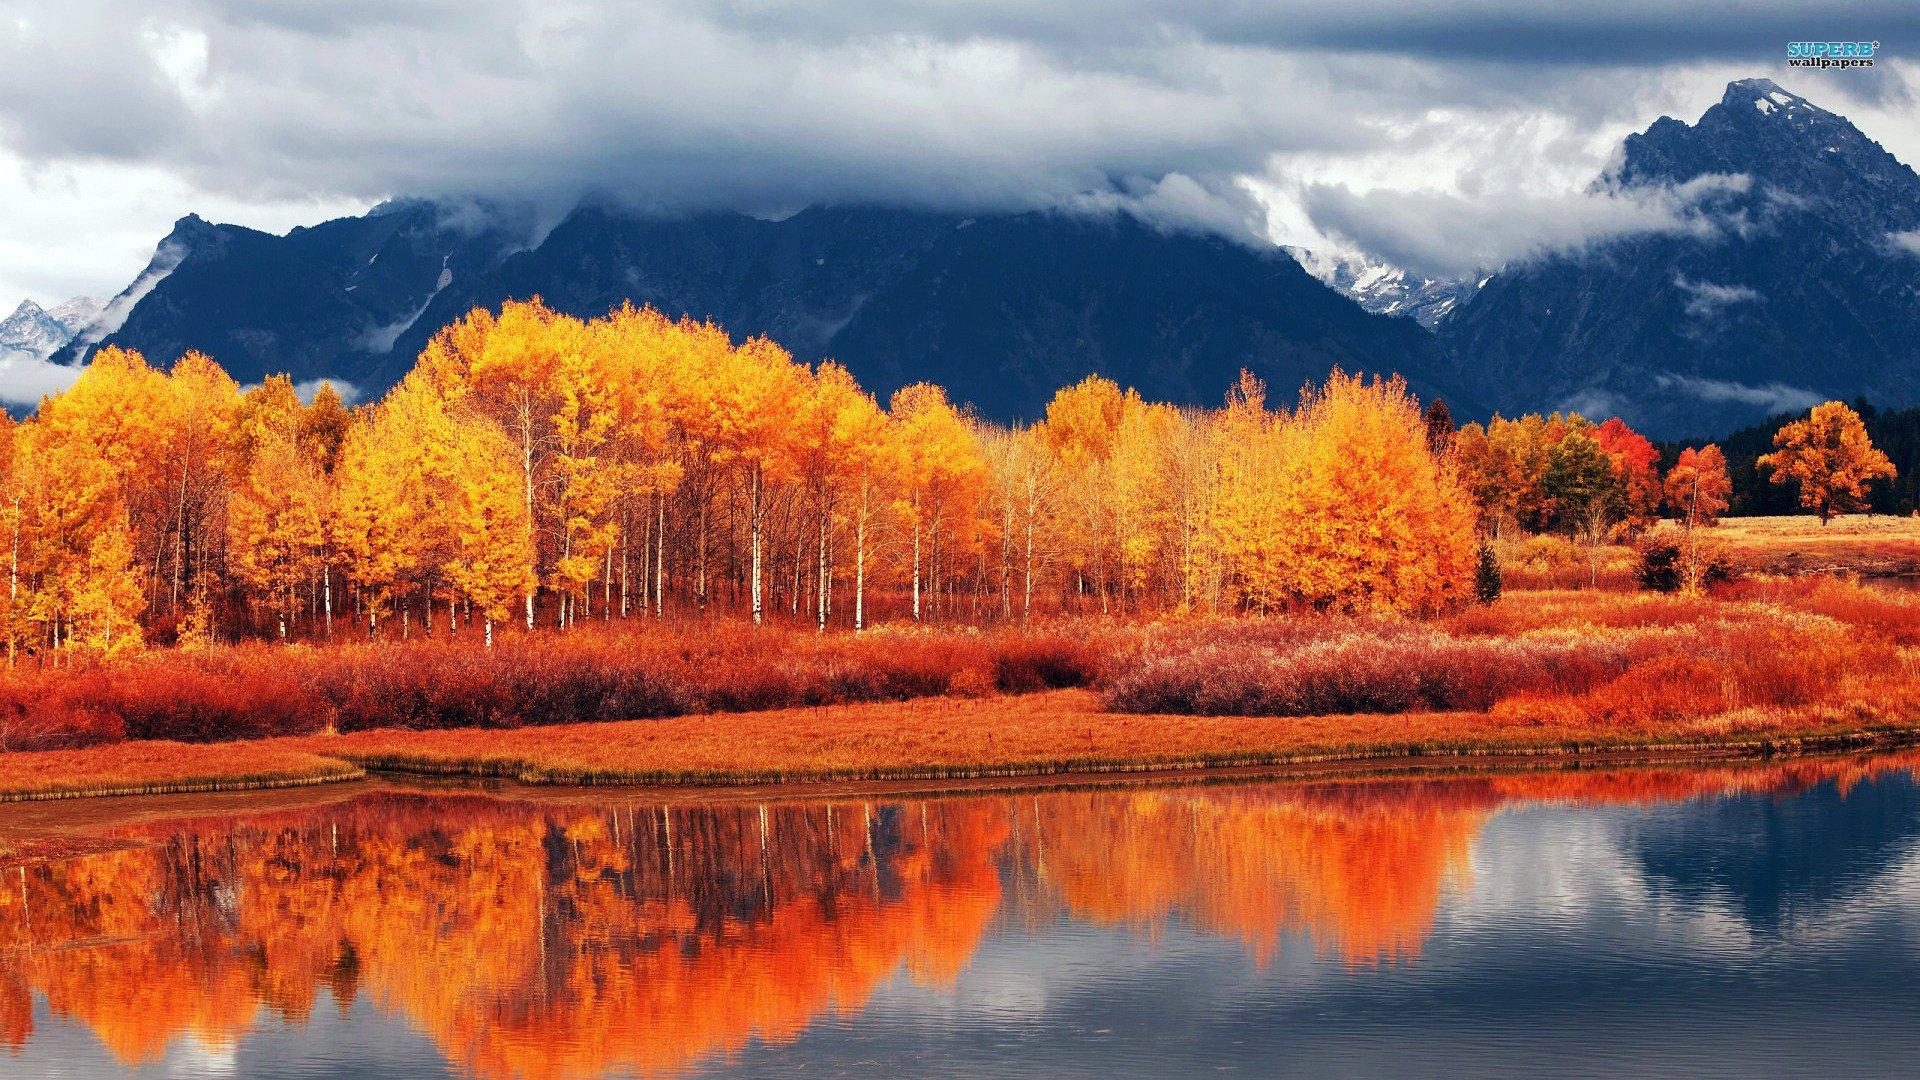 moose fall desktop wallpaper - photo #19